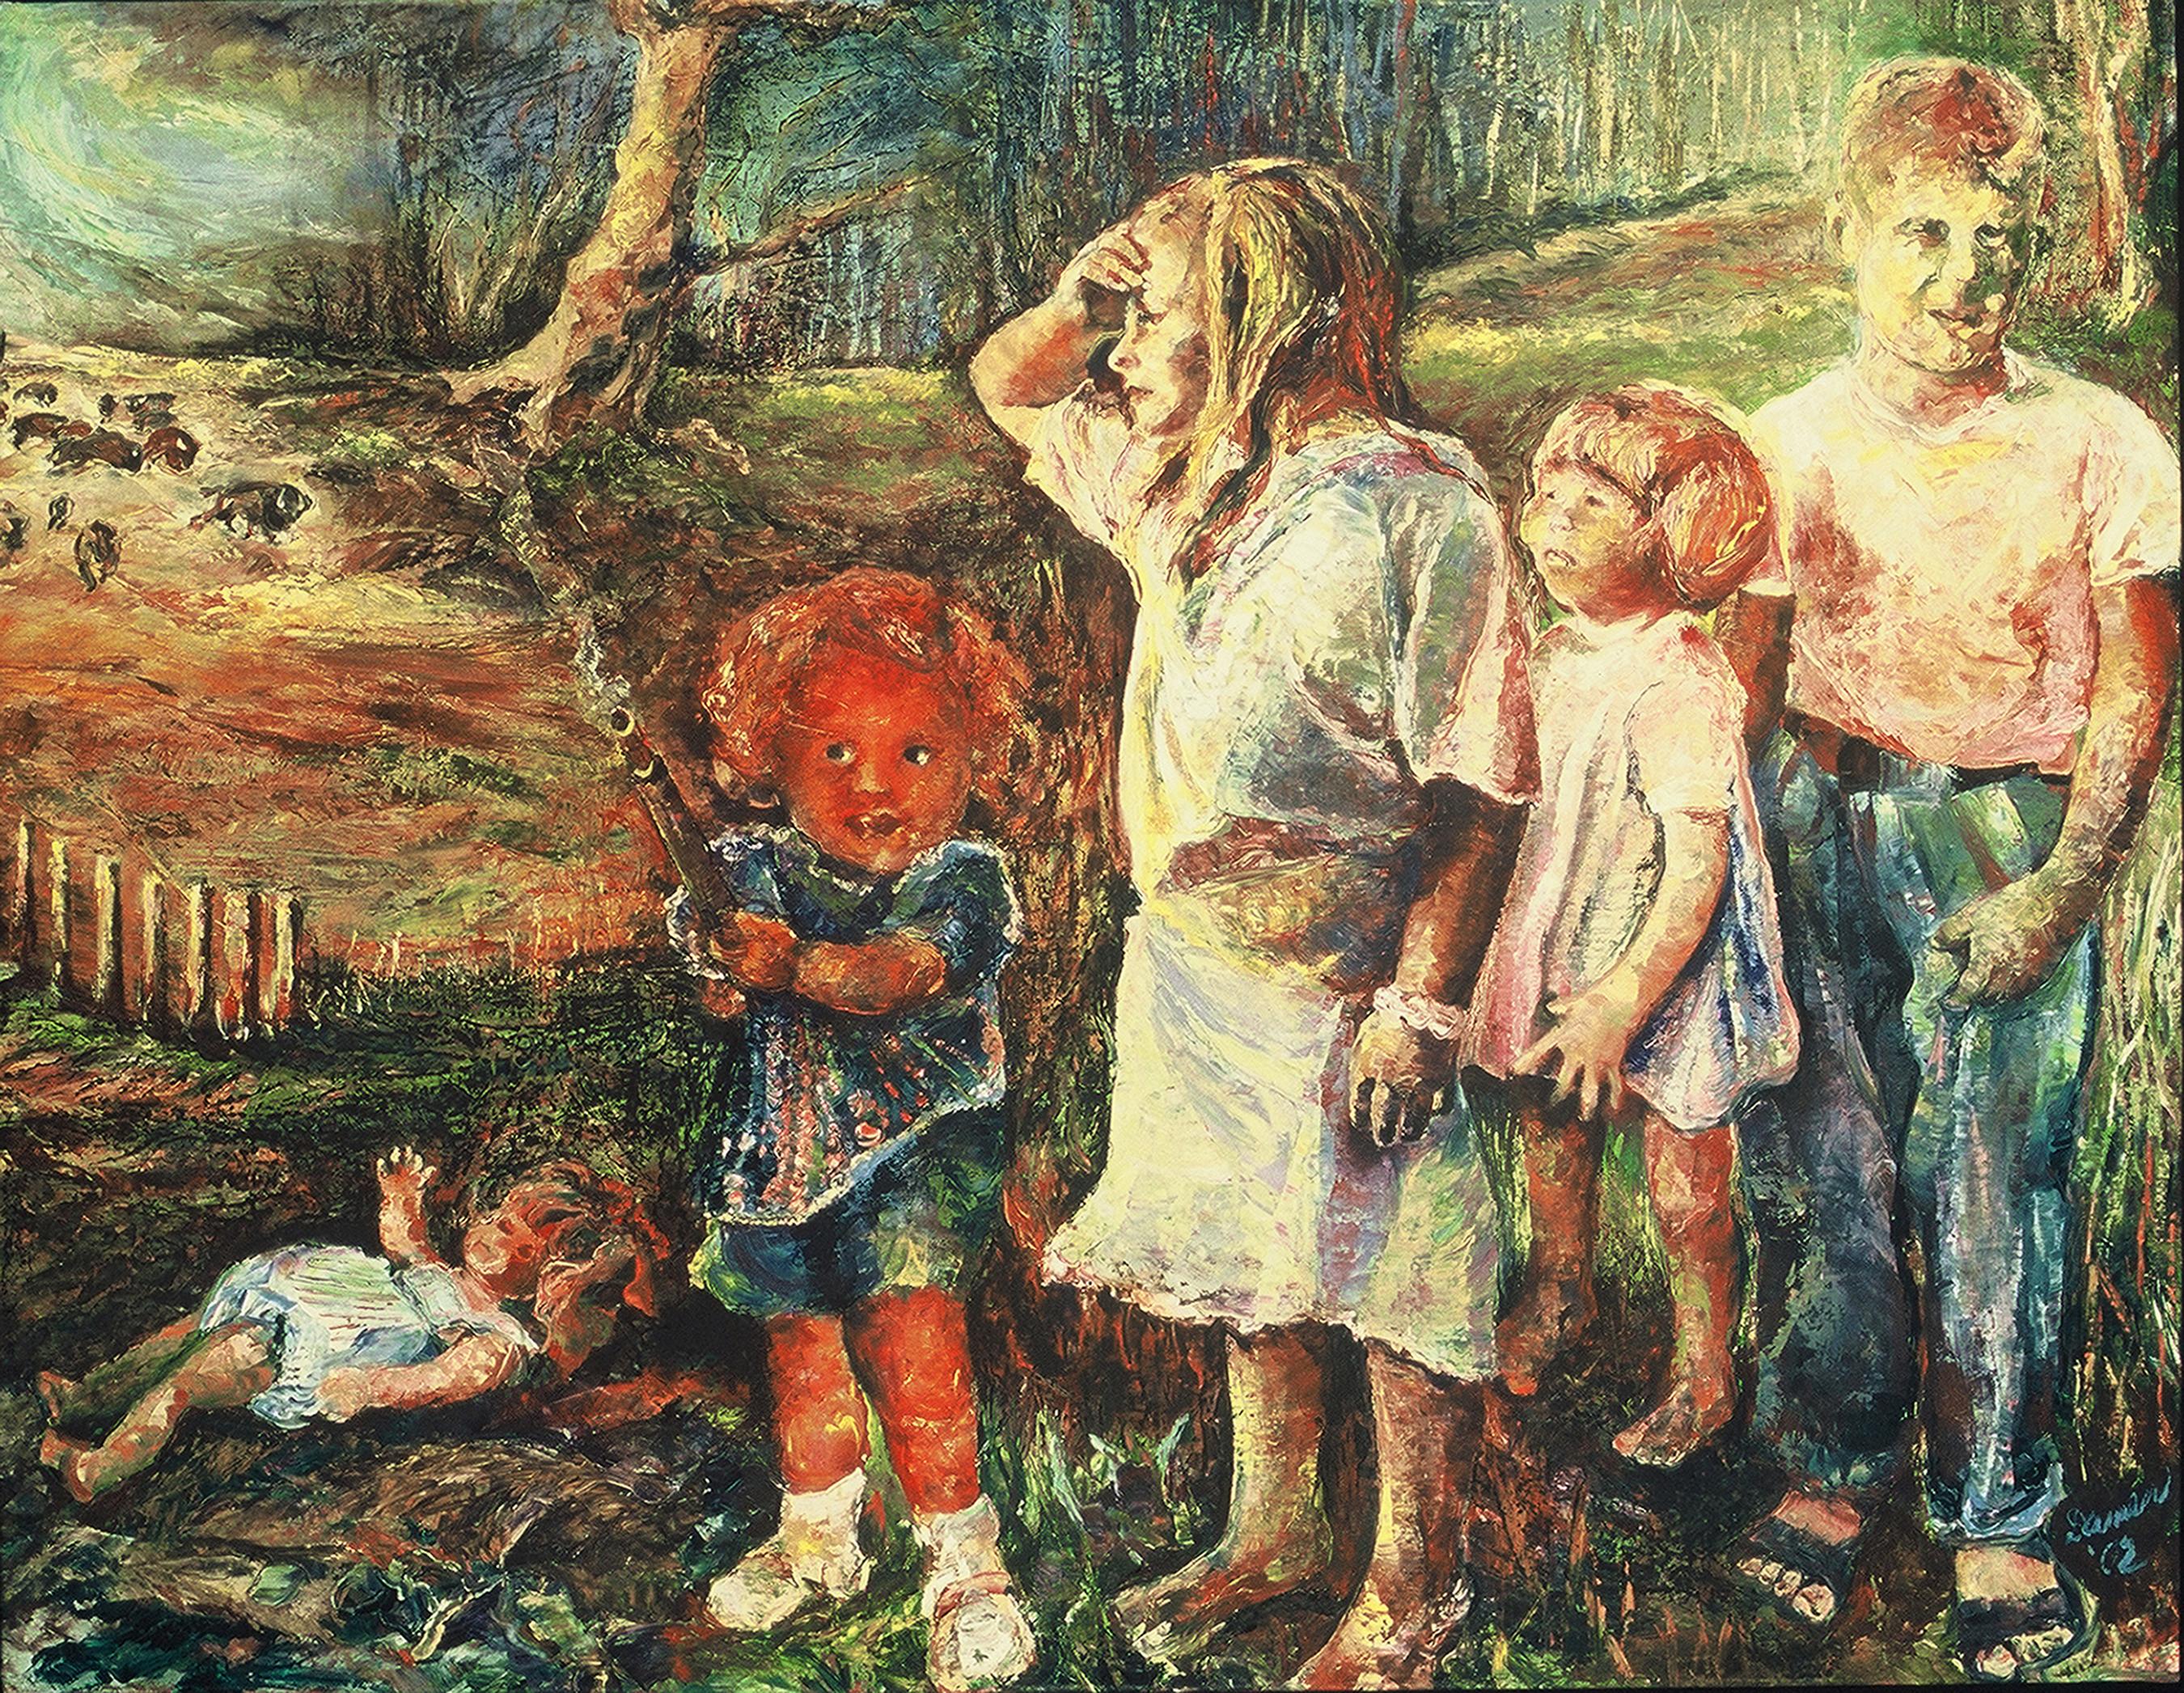 September 11, 2001, painting, poetry, children, archetypes